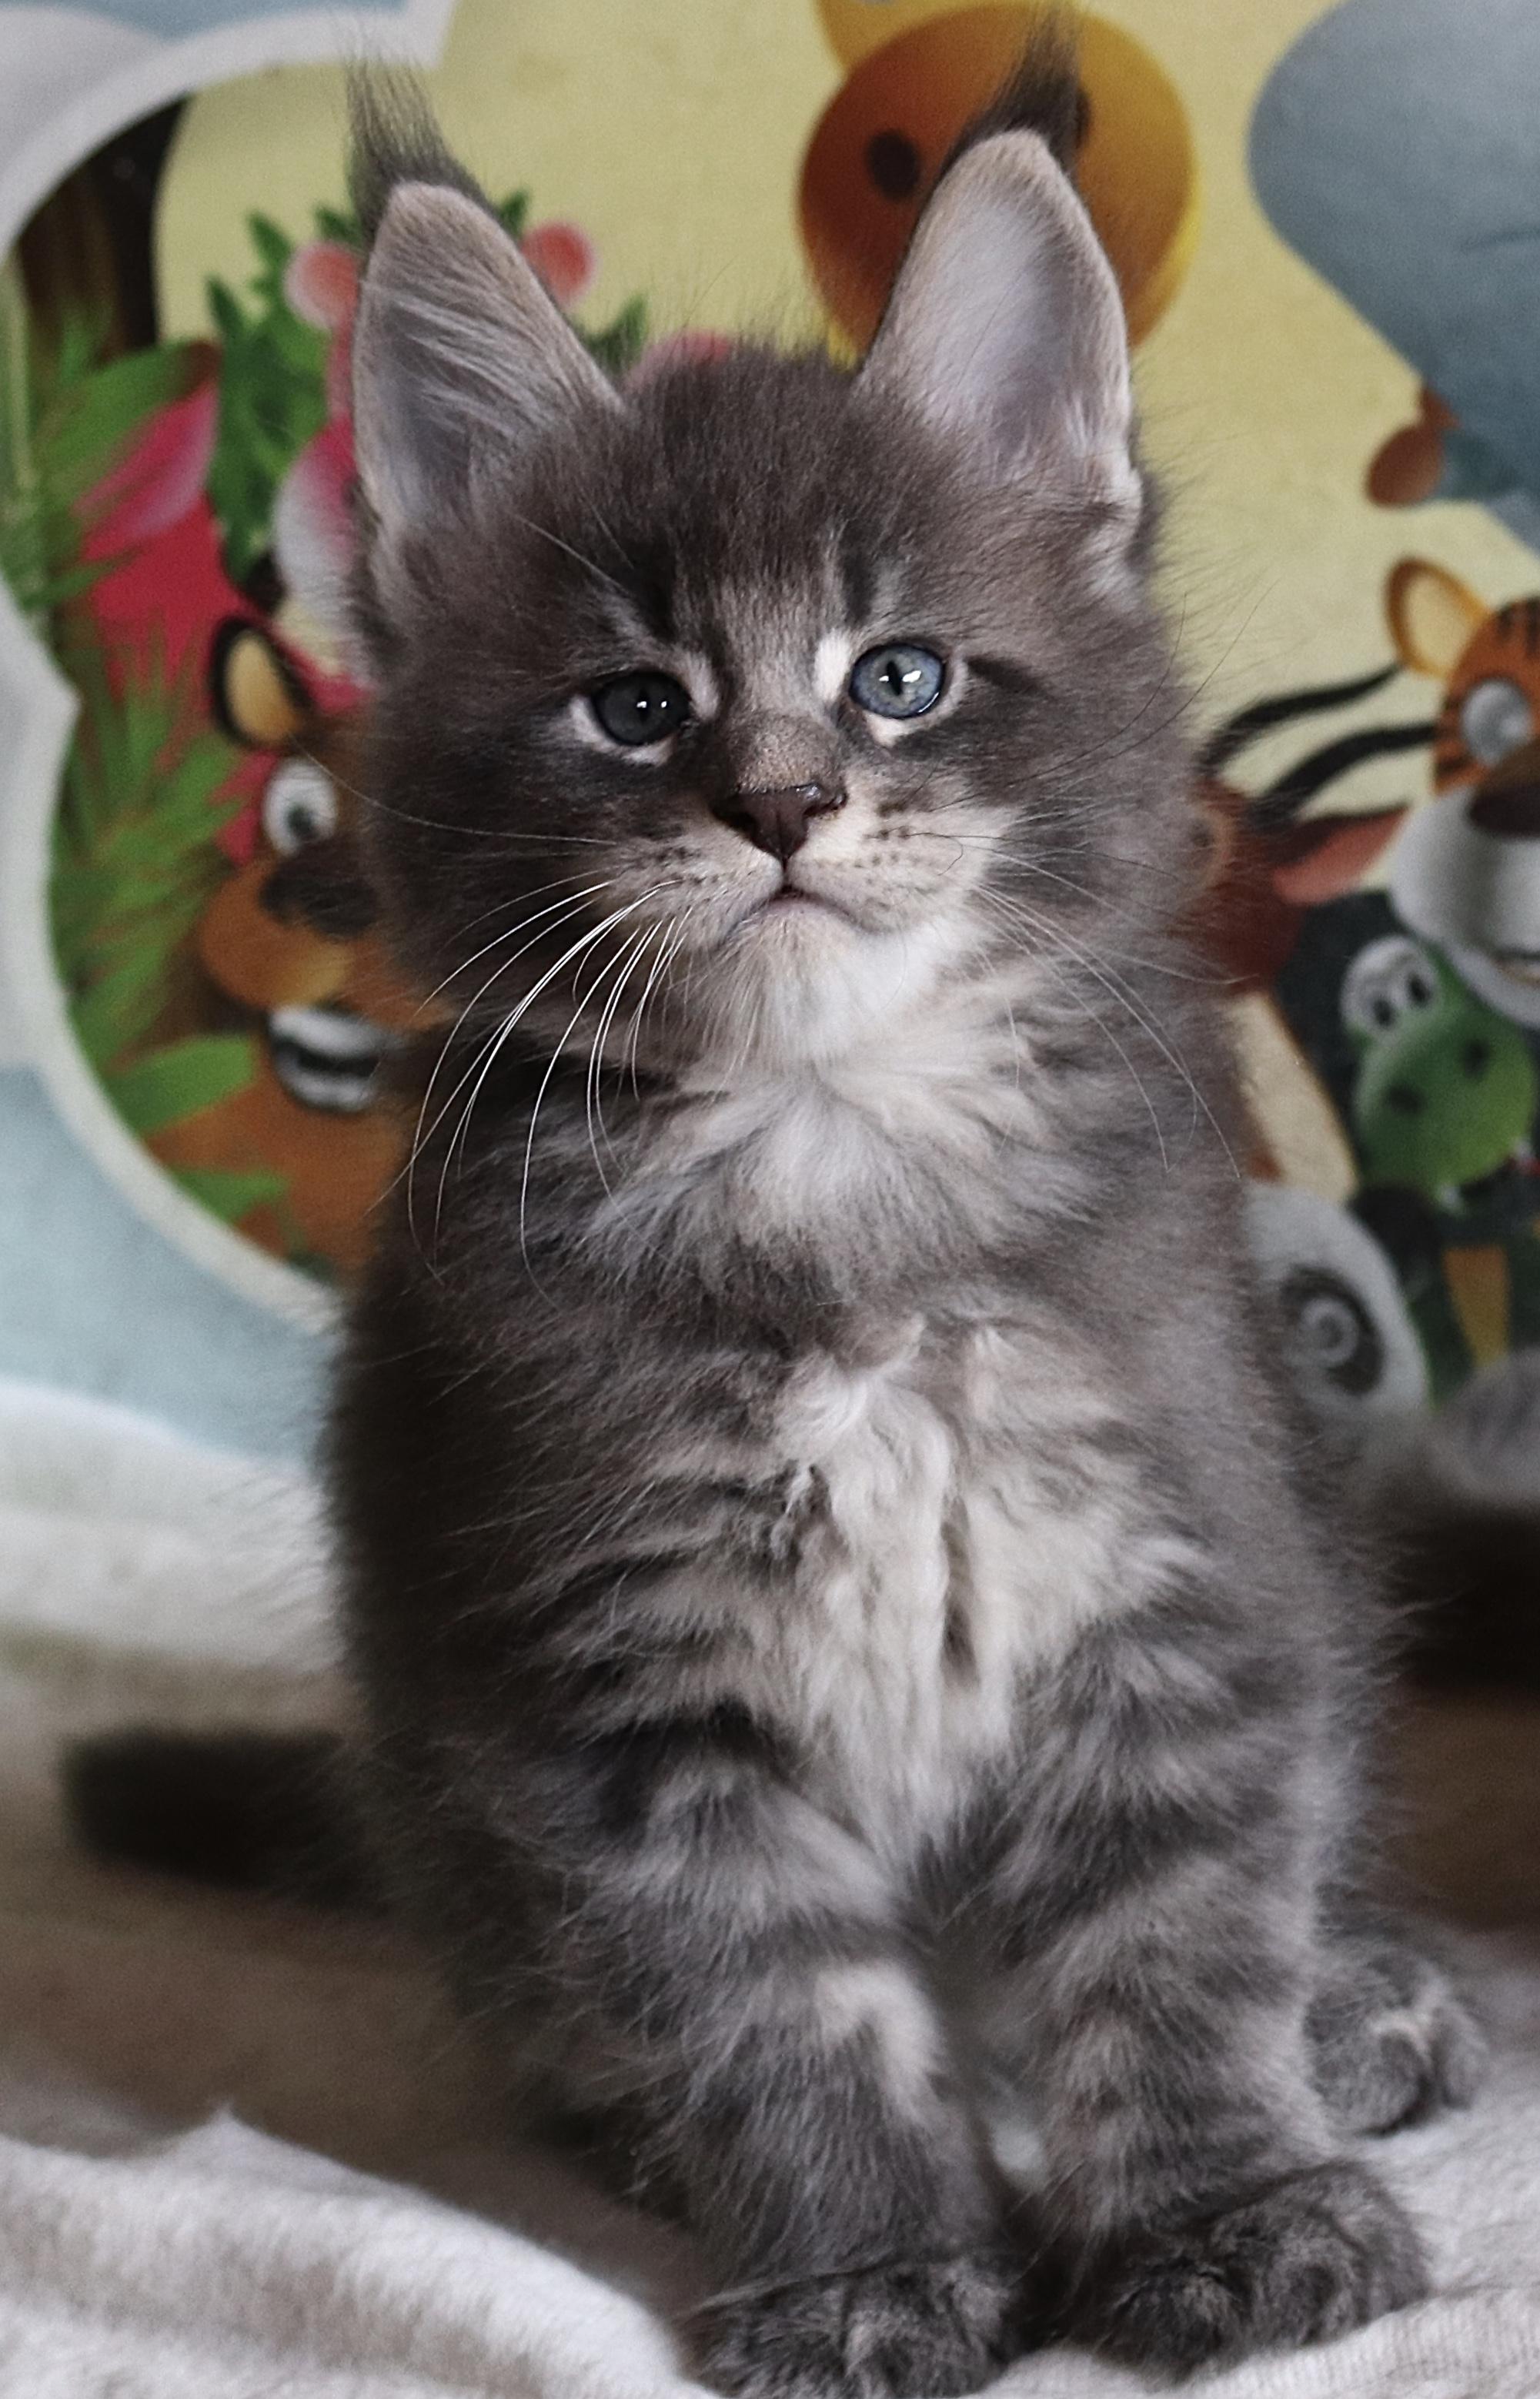 fotka kočky OLIVER GRAND VON ERILLIAN,CZ, male